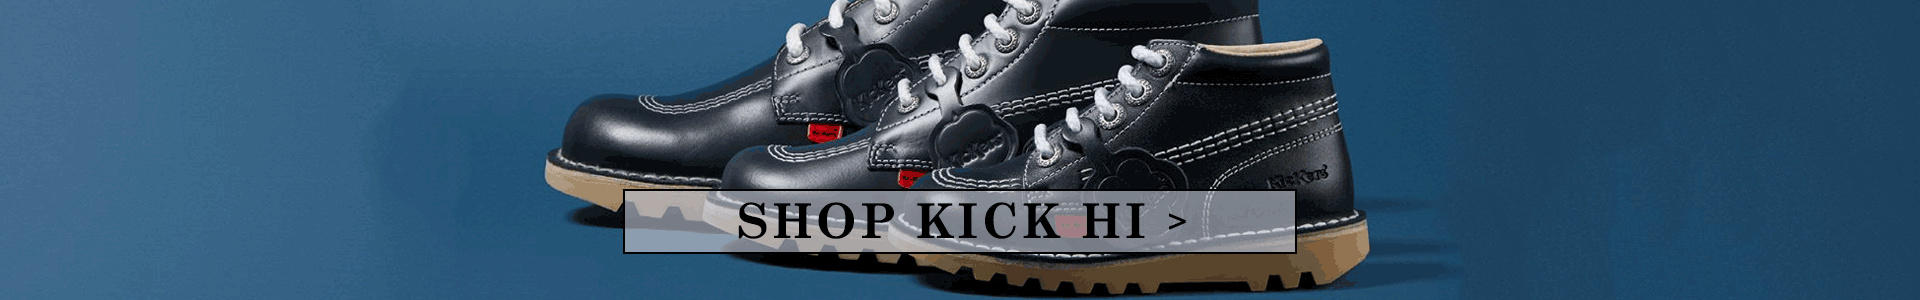 Shop Kick Hi Collection